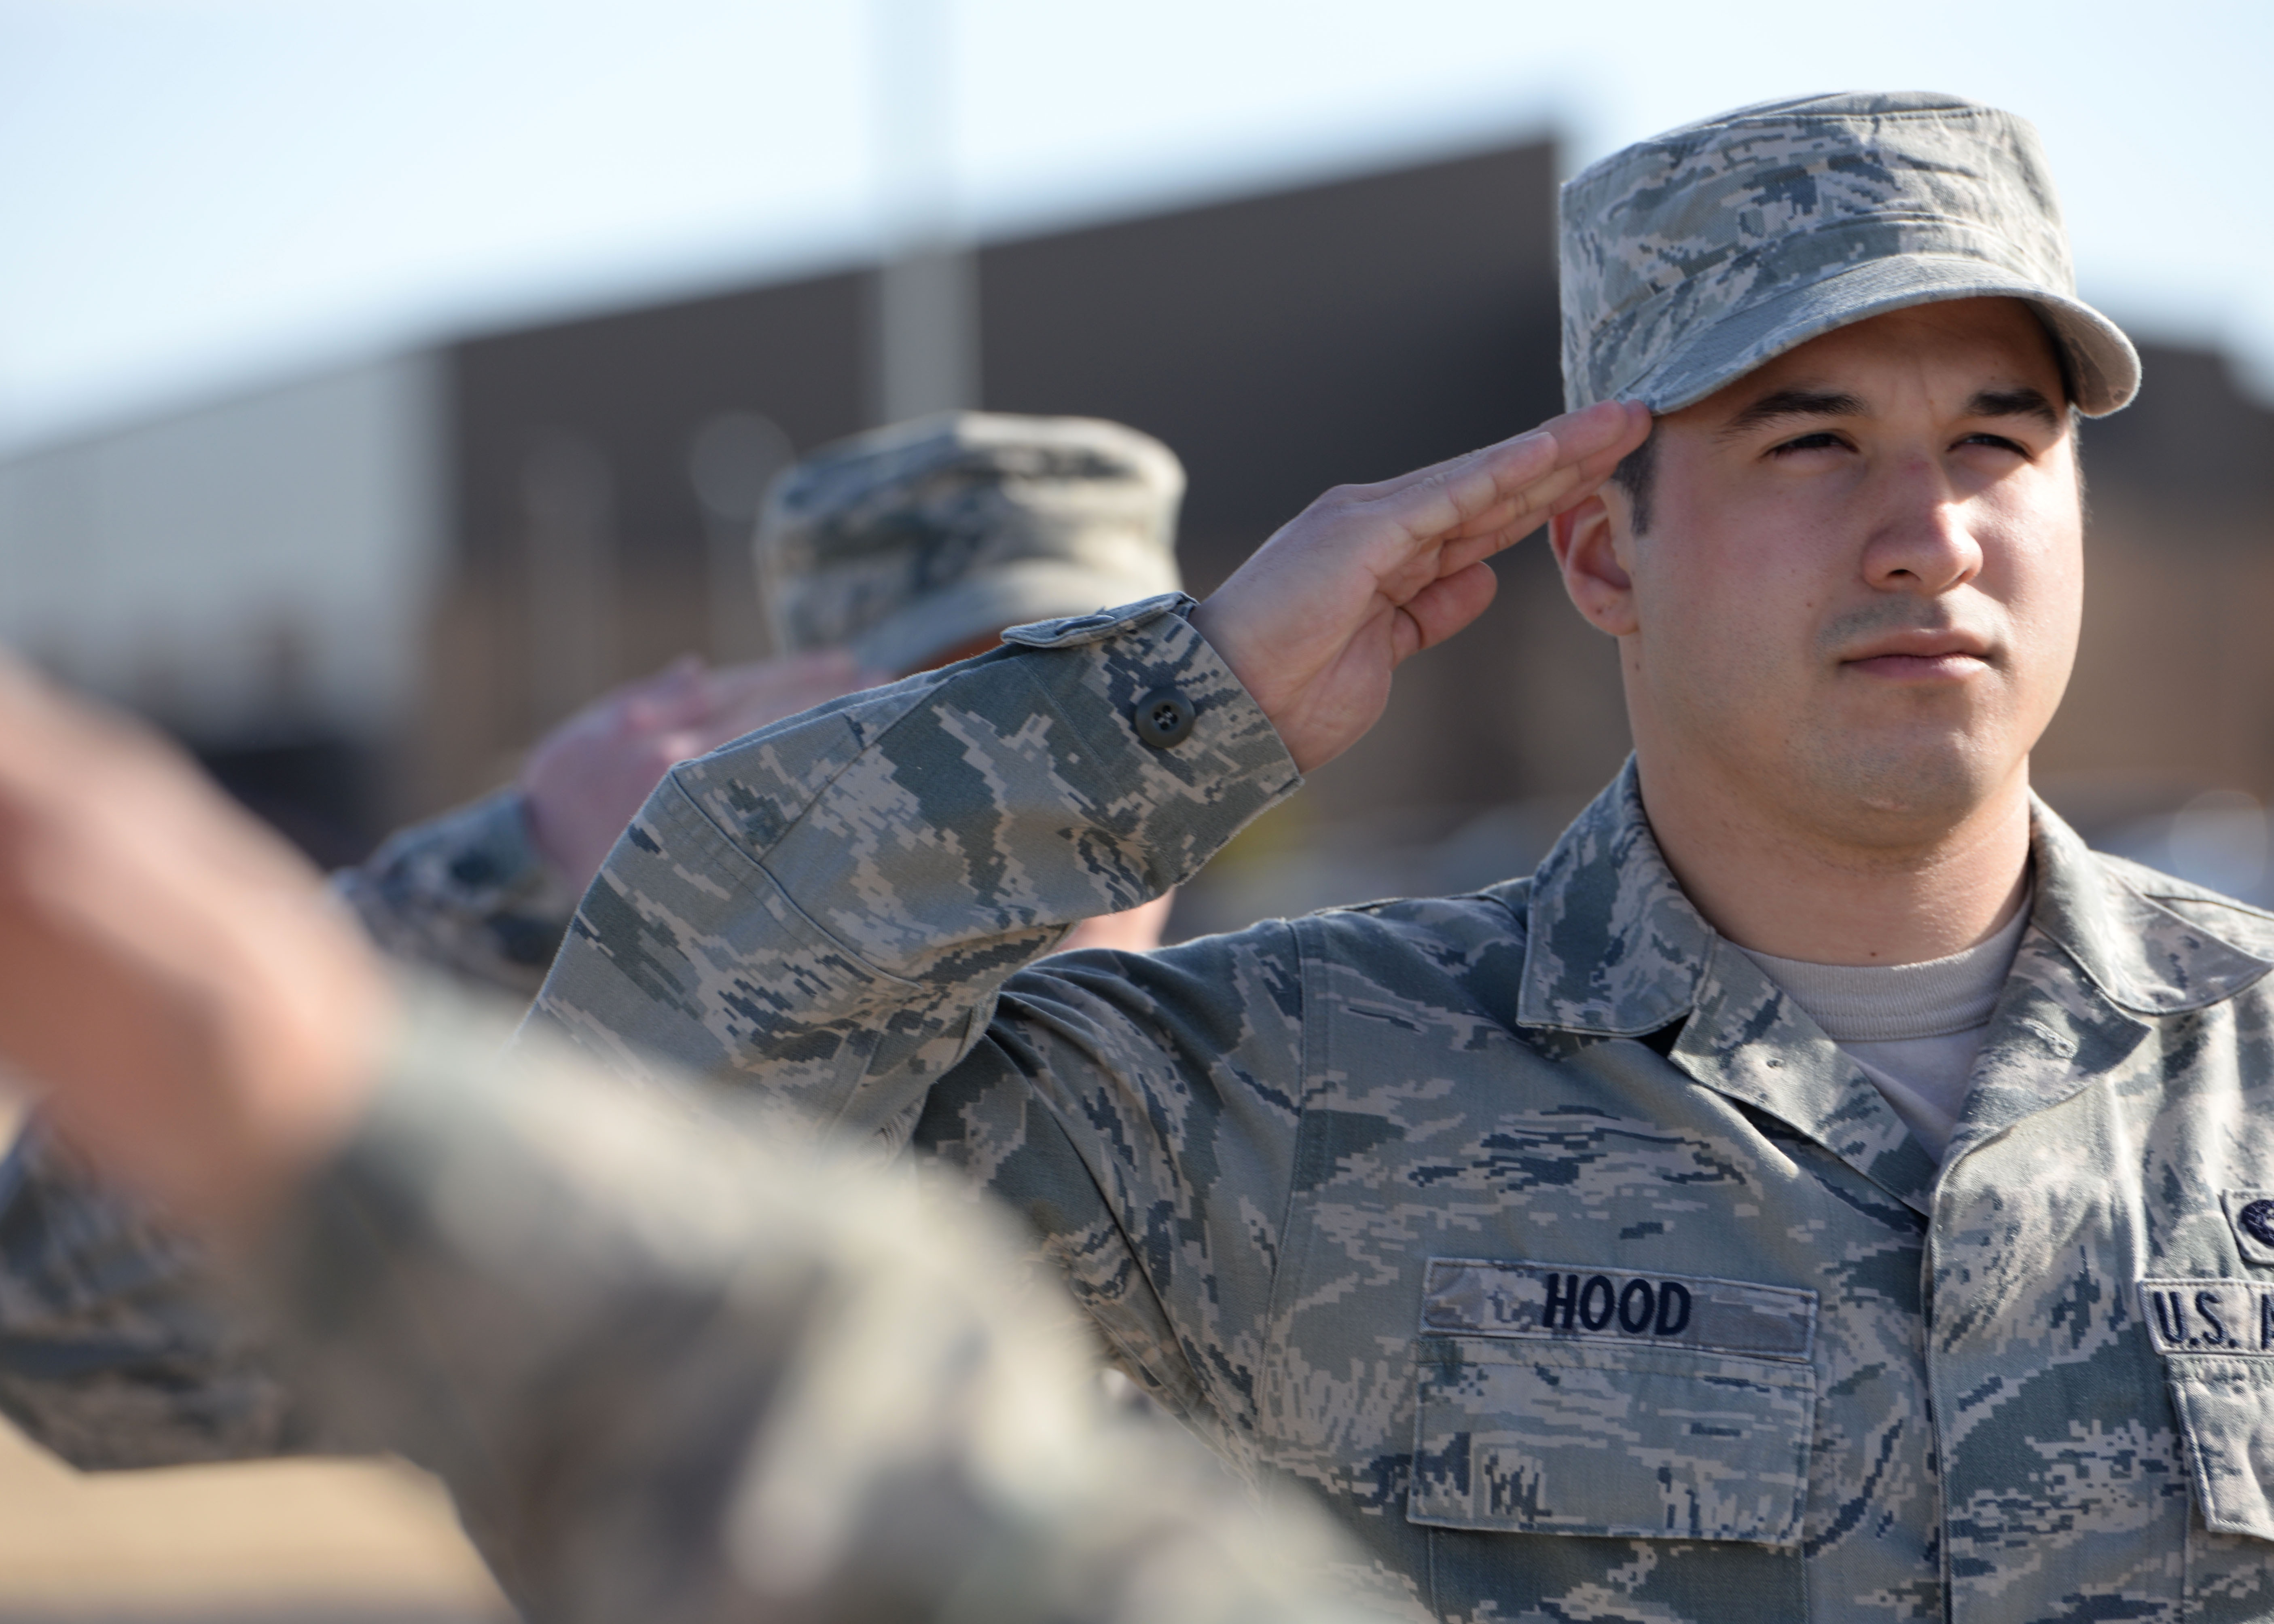 NCO dating Airman